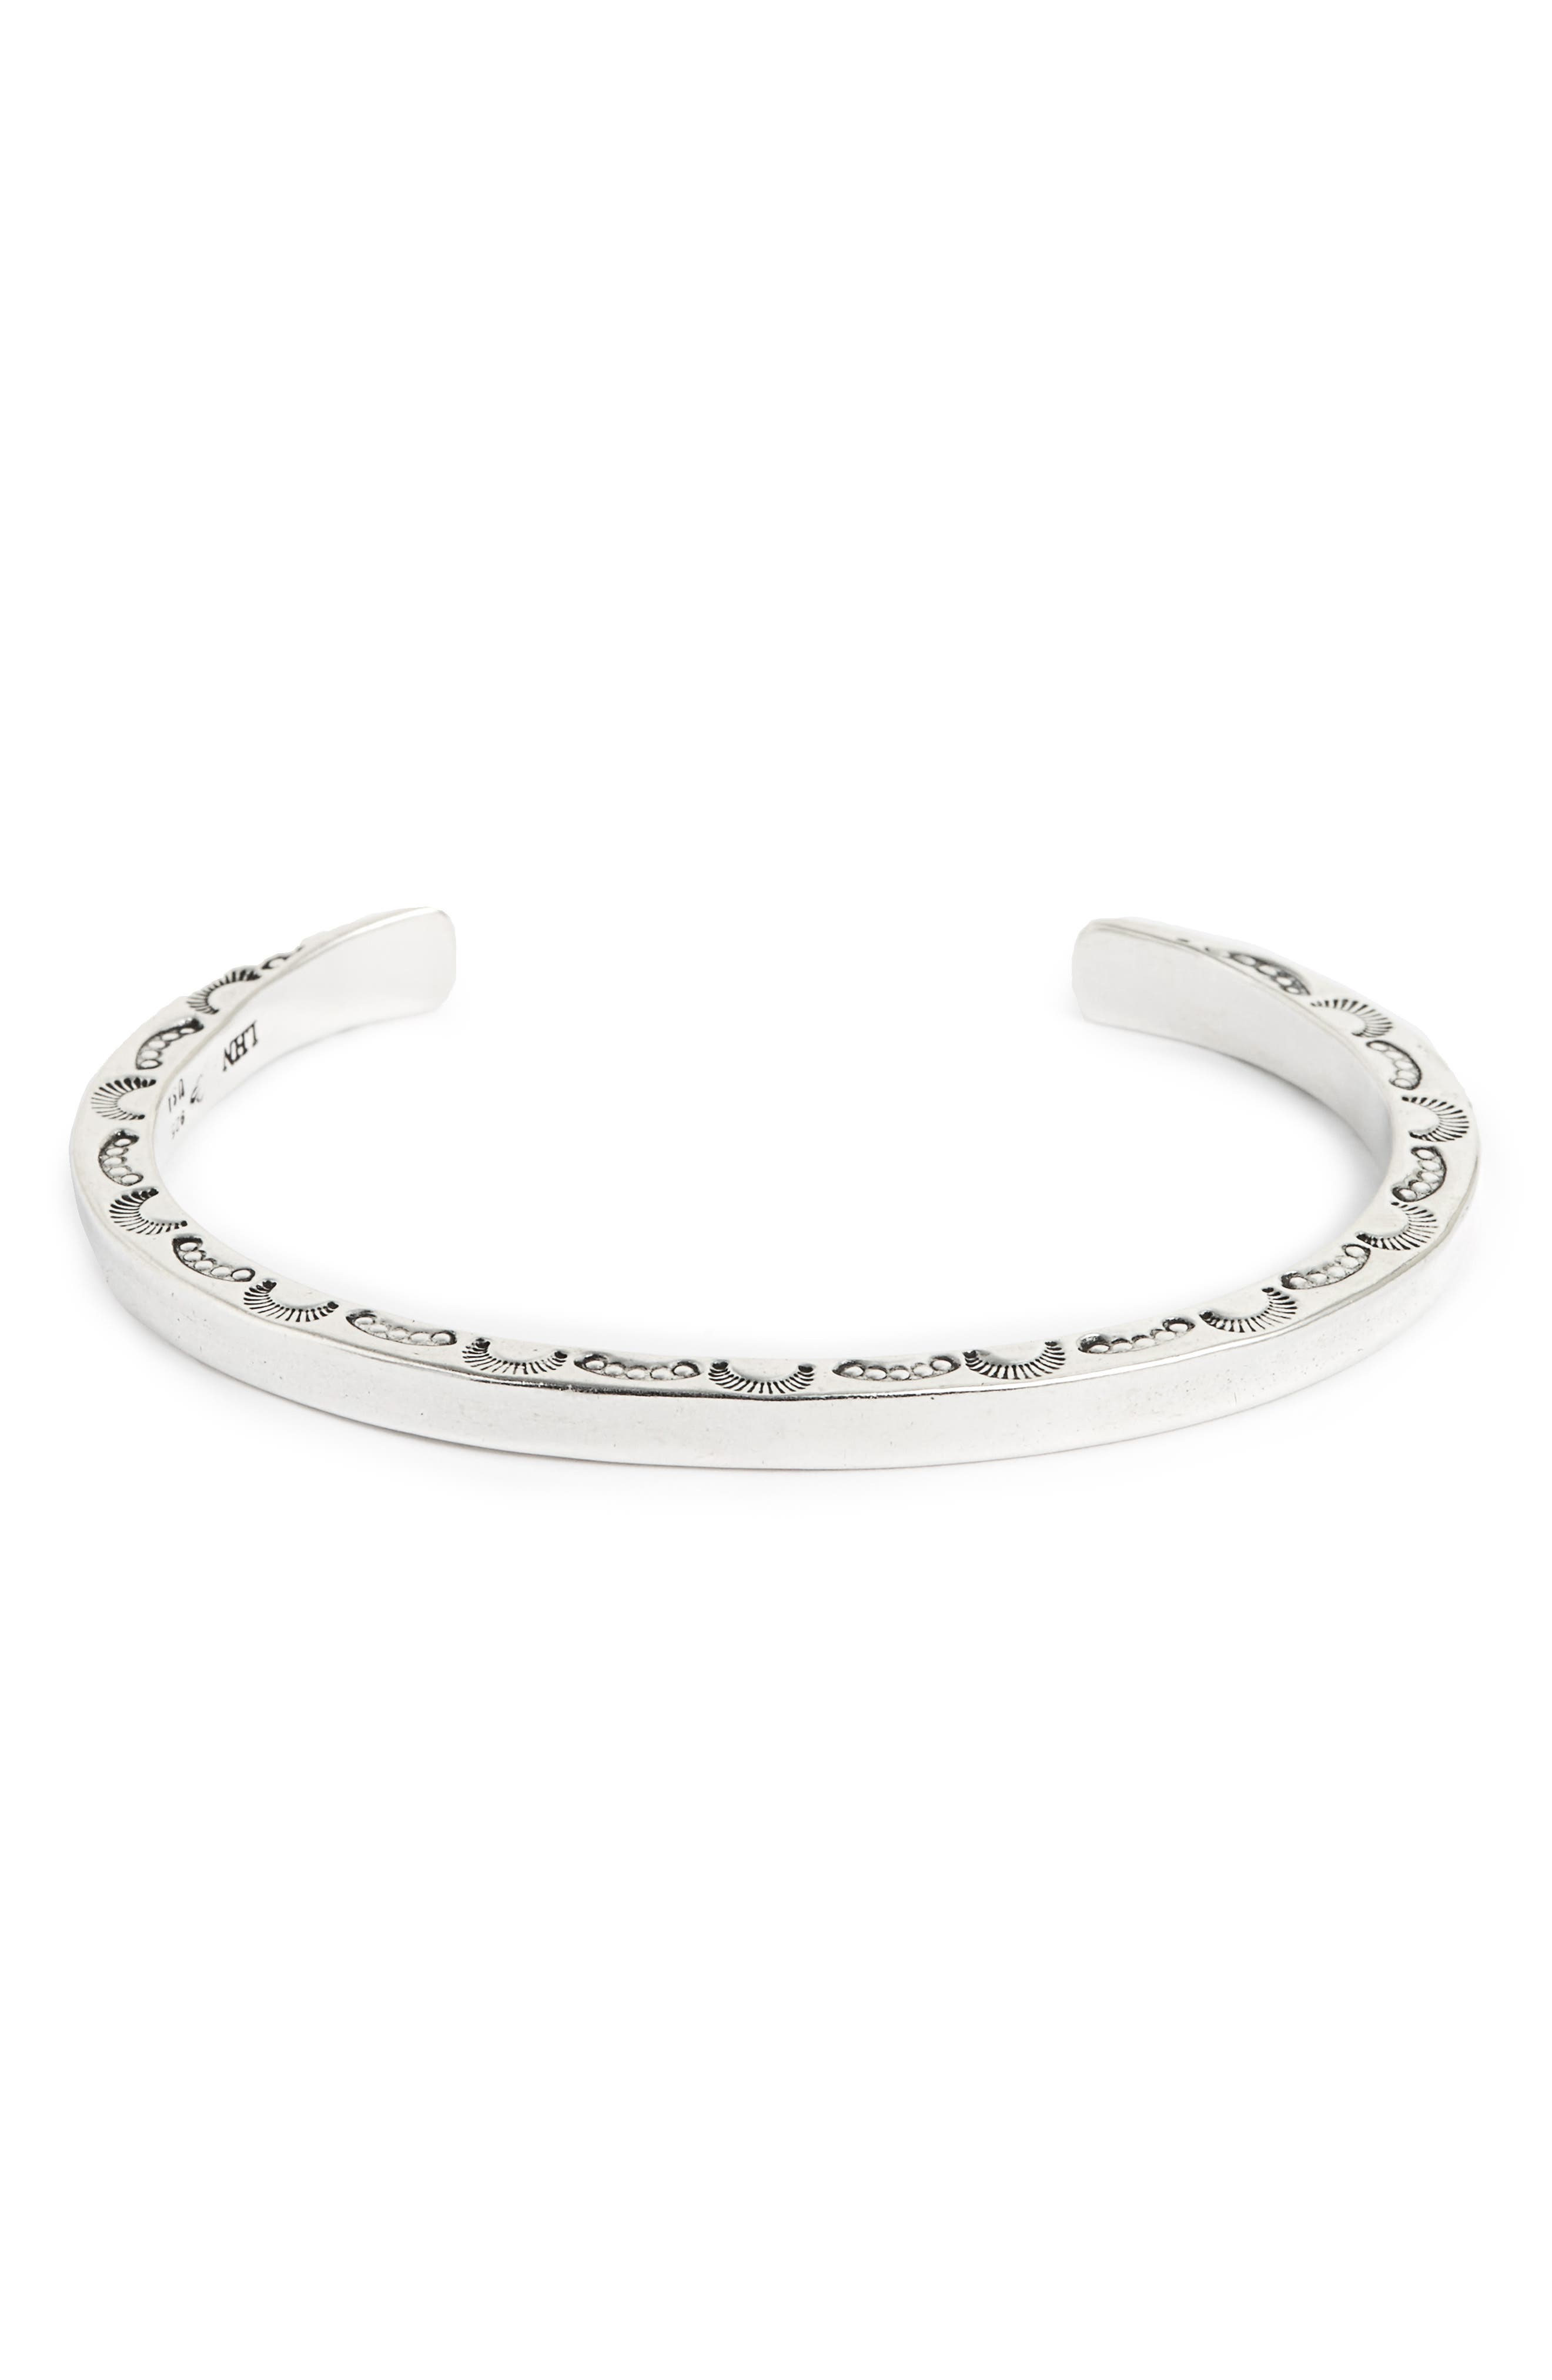 Alternate Image 1 Selected - Lewis Henry Nicholas Sterling Silver Cuff Bracelet